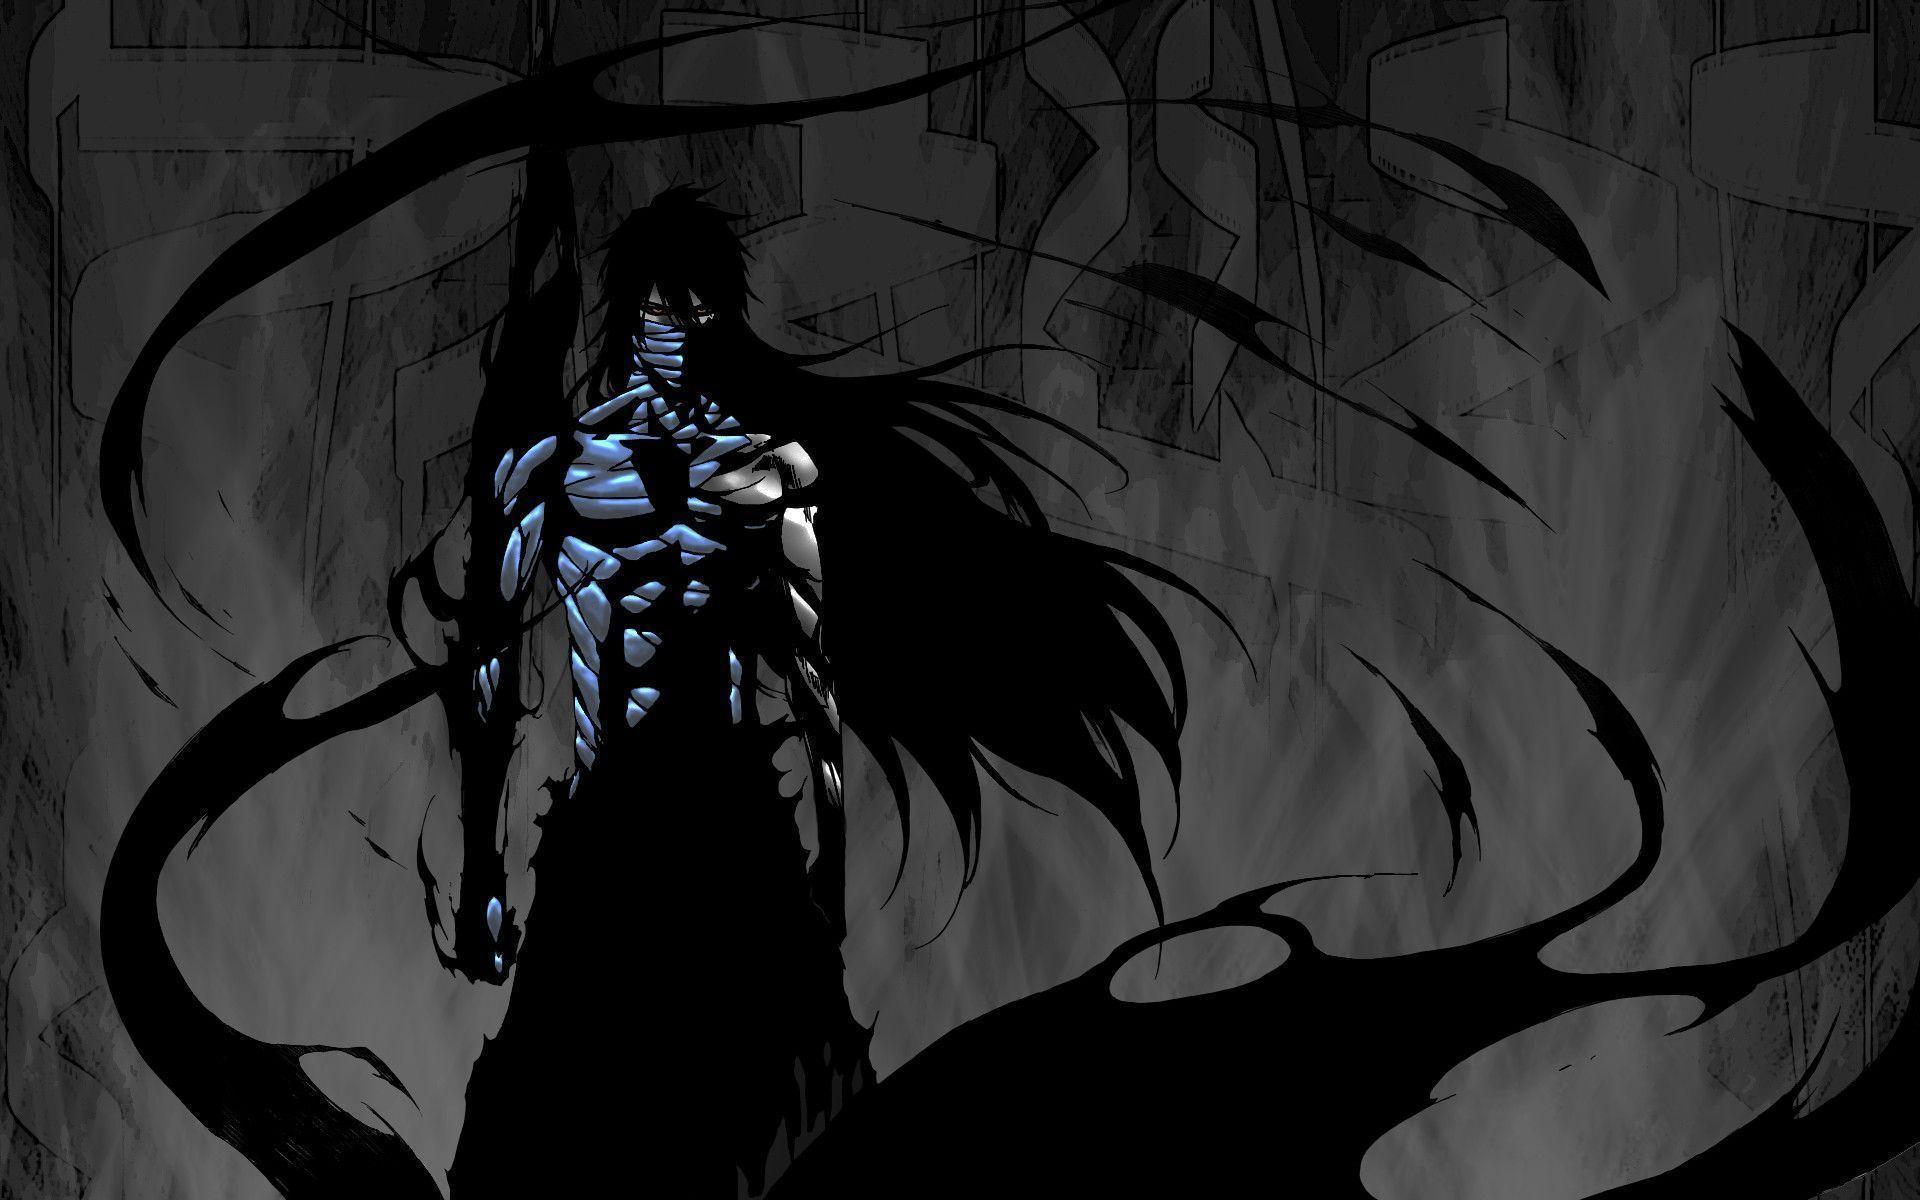 Dark Anime Wallpapers - Wallpaper Cave